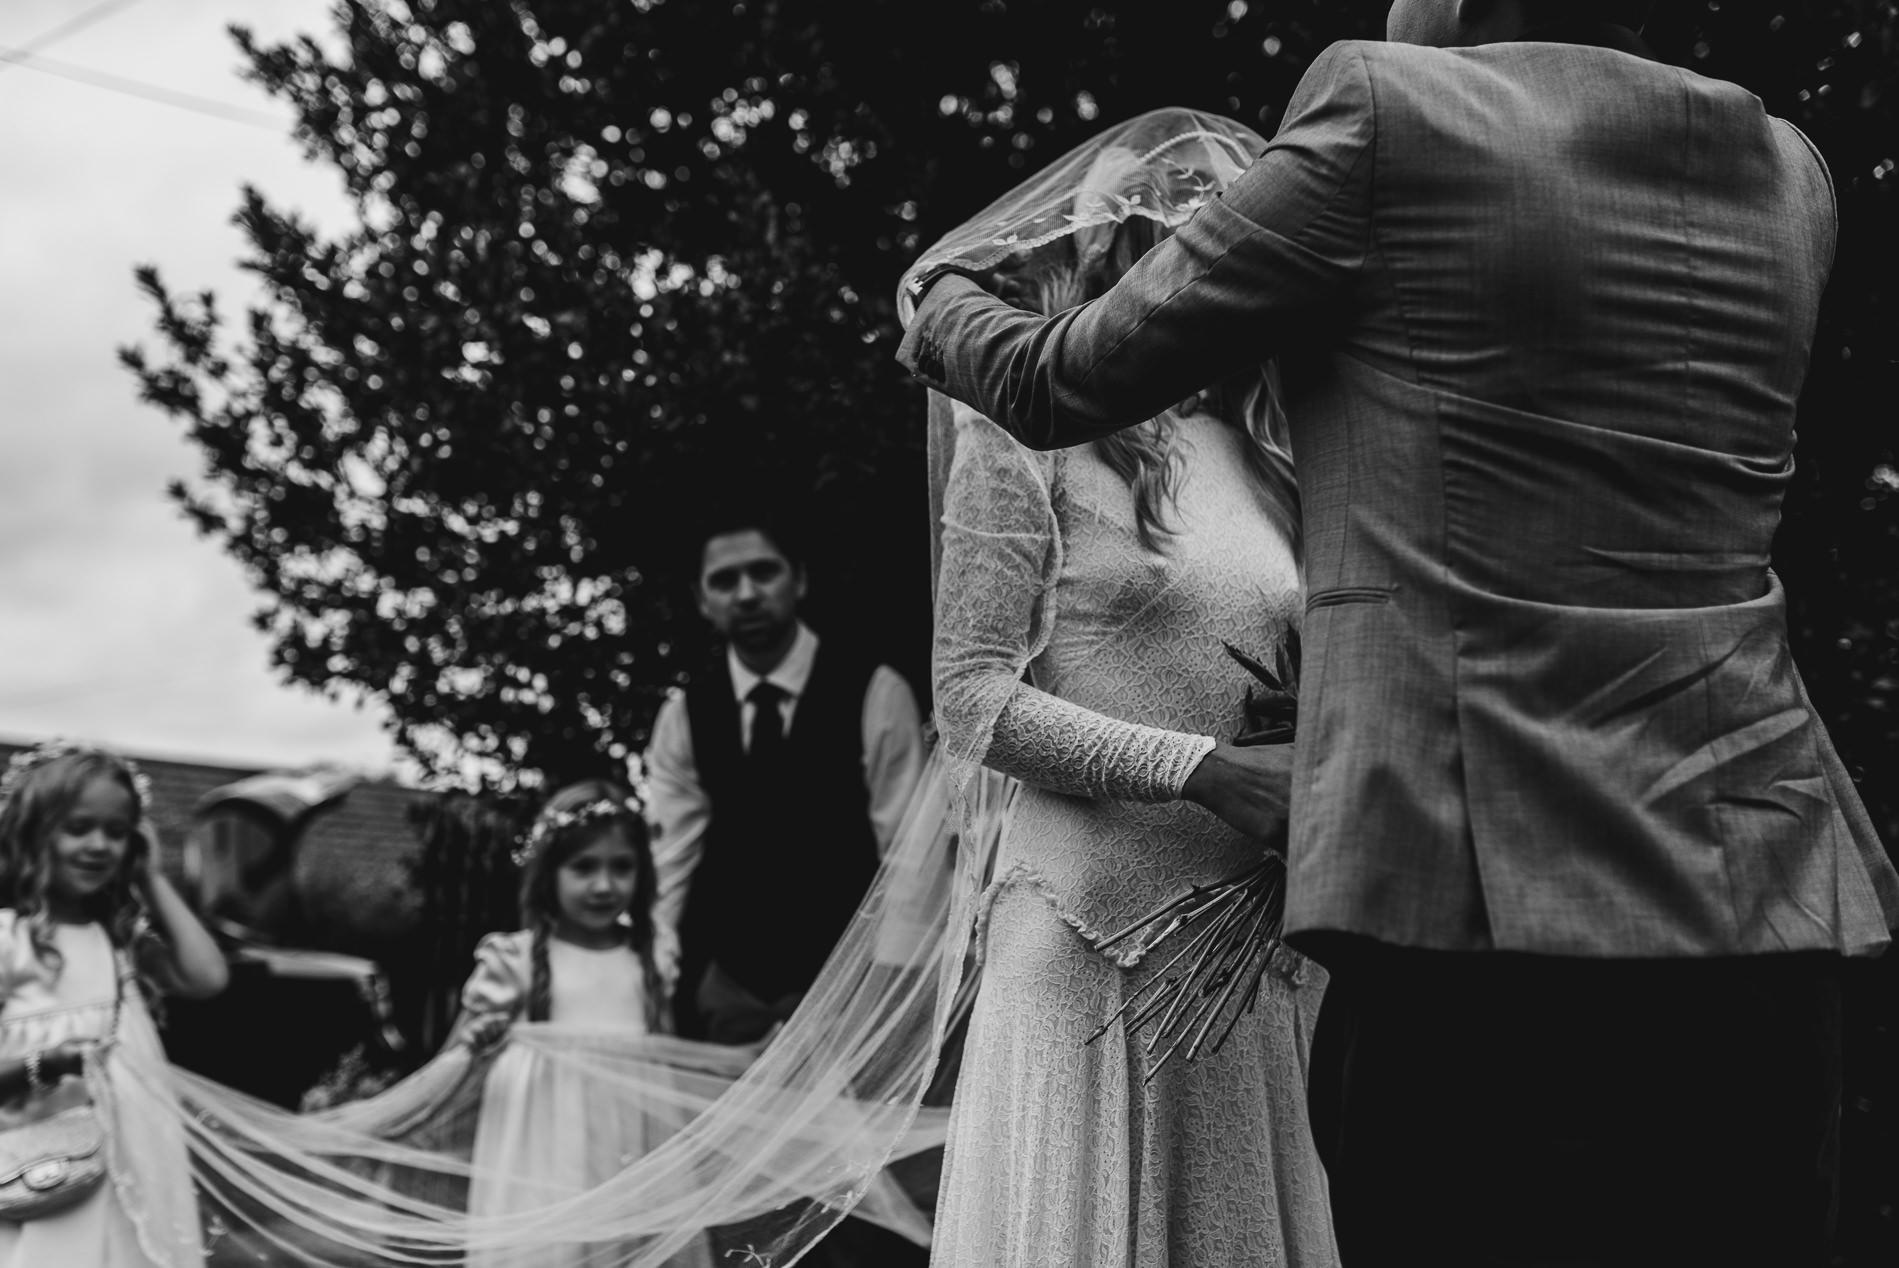 bohemian_wedding_lawshall_church_garden34